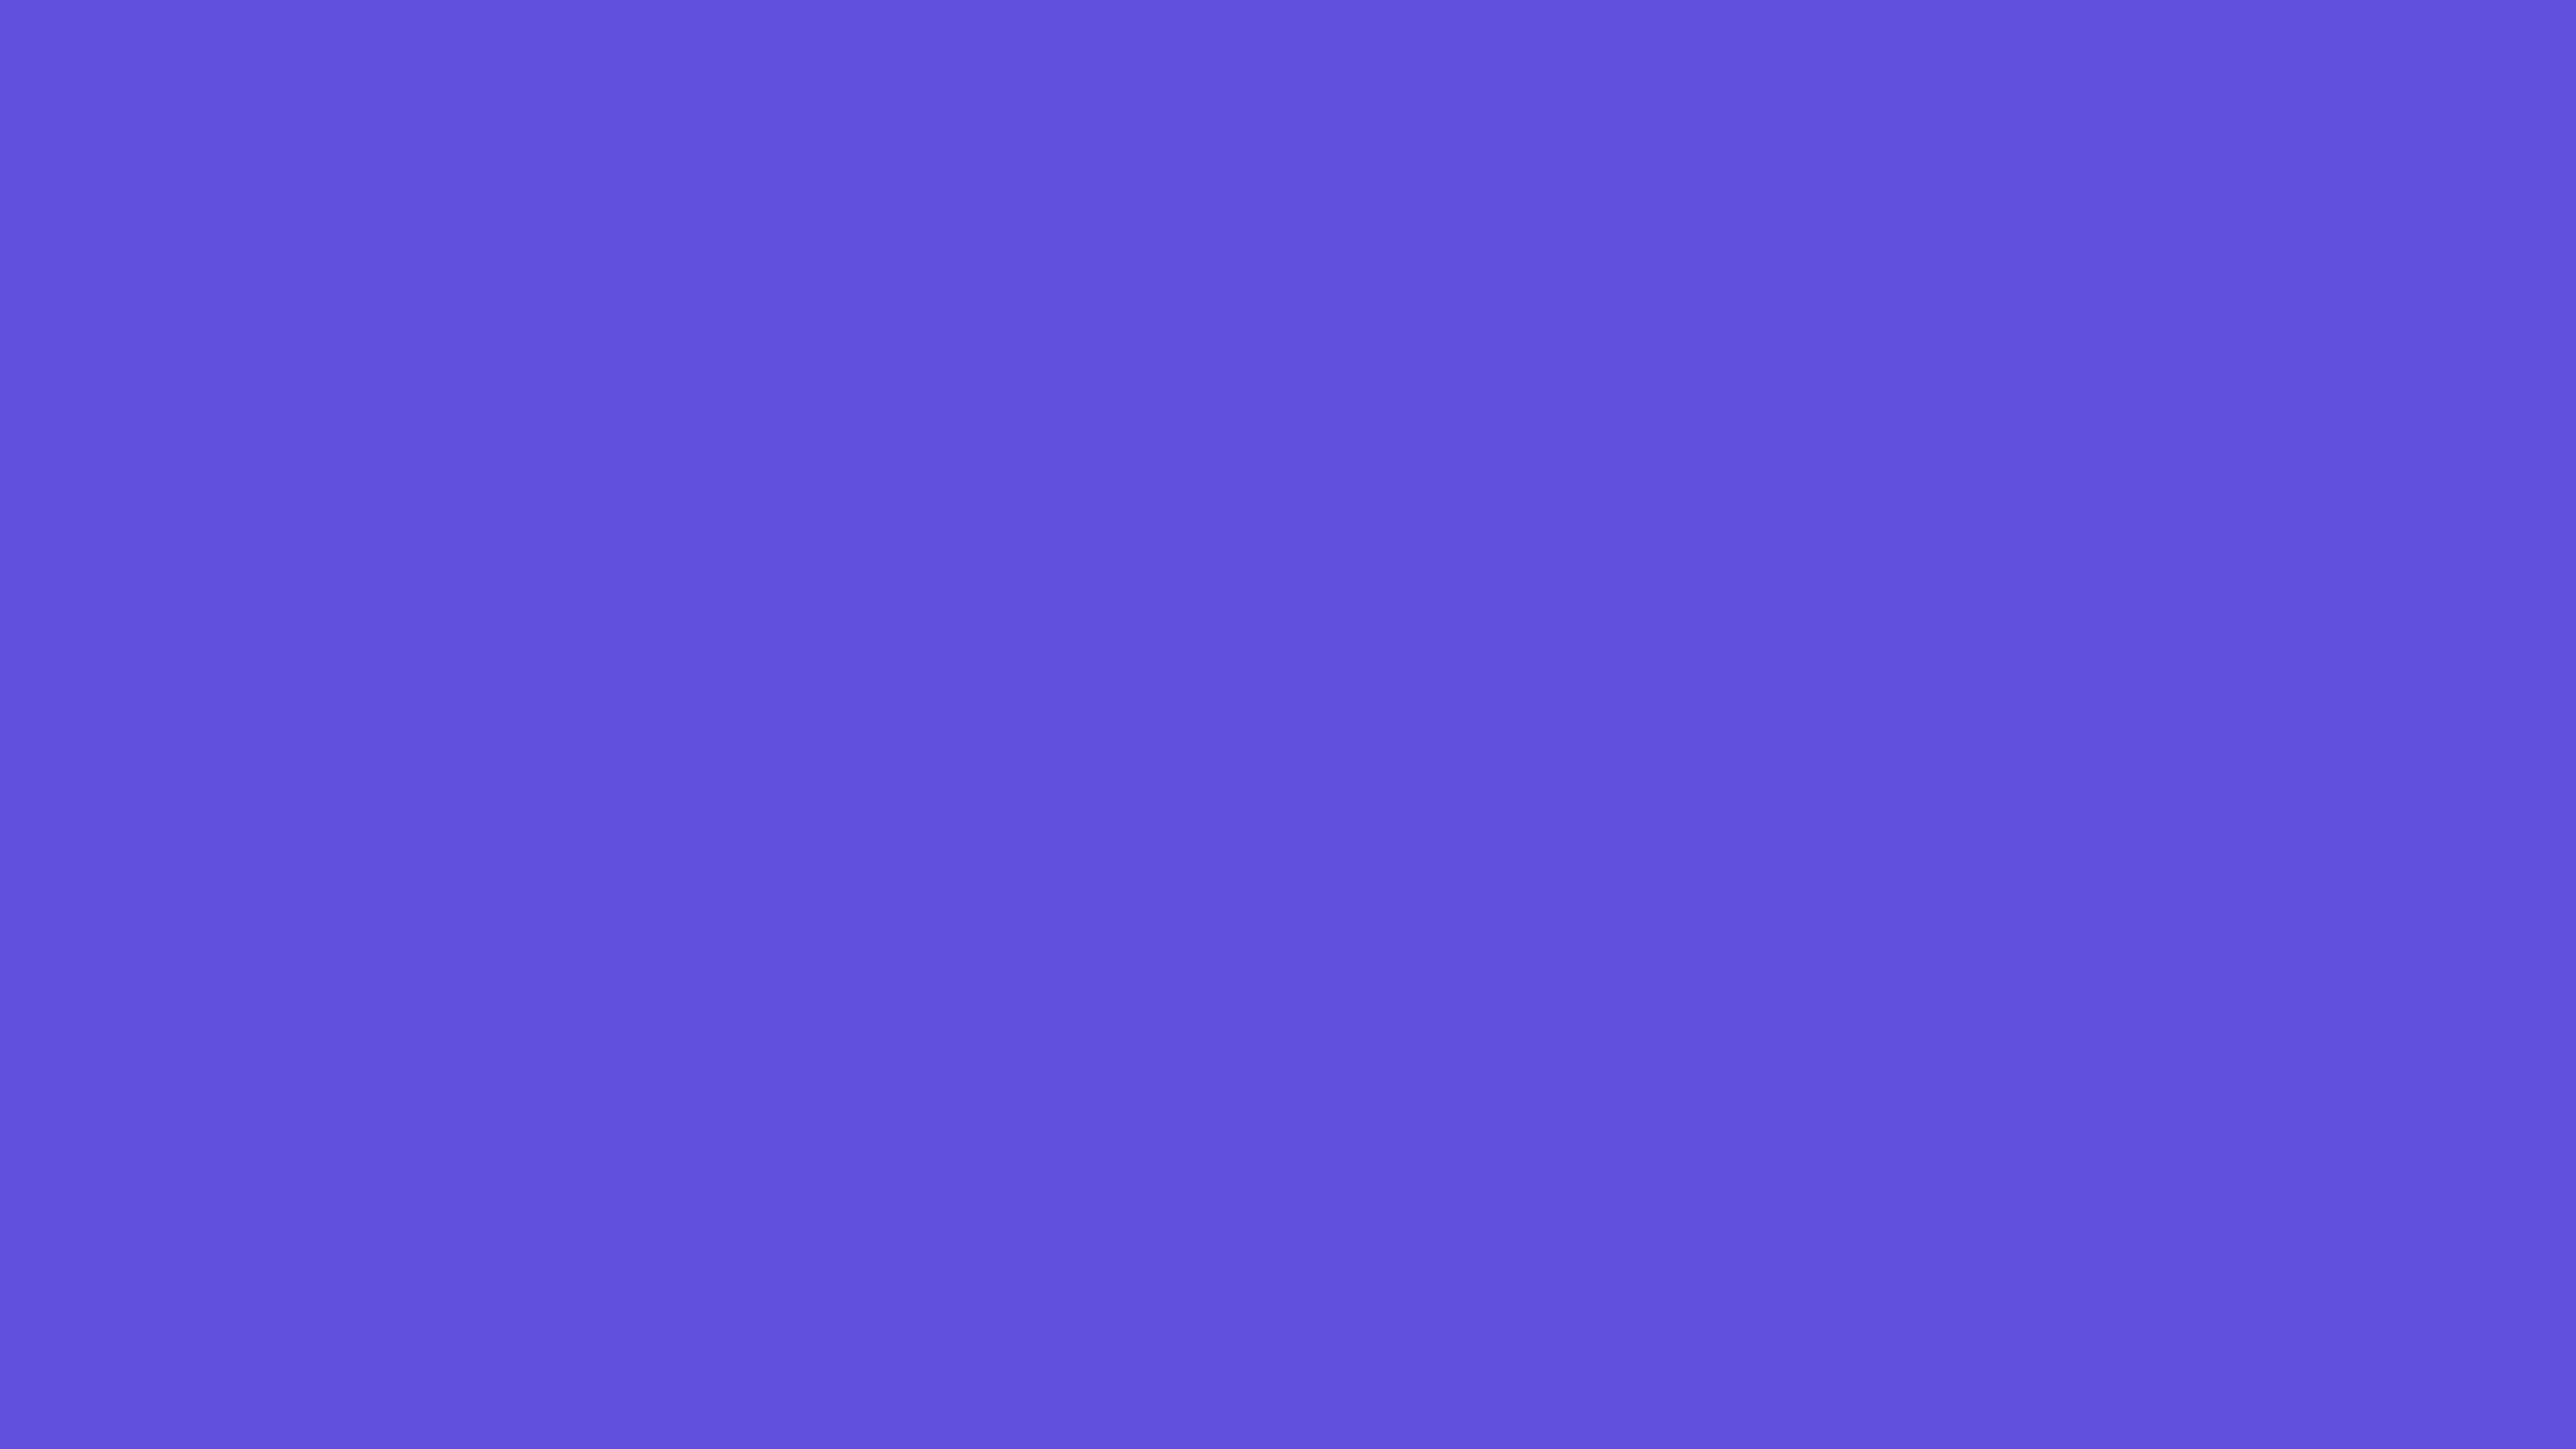 4096x2304 Majorelle Blue Solid Color Background